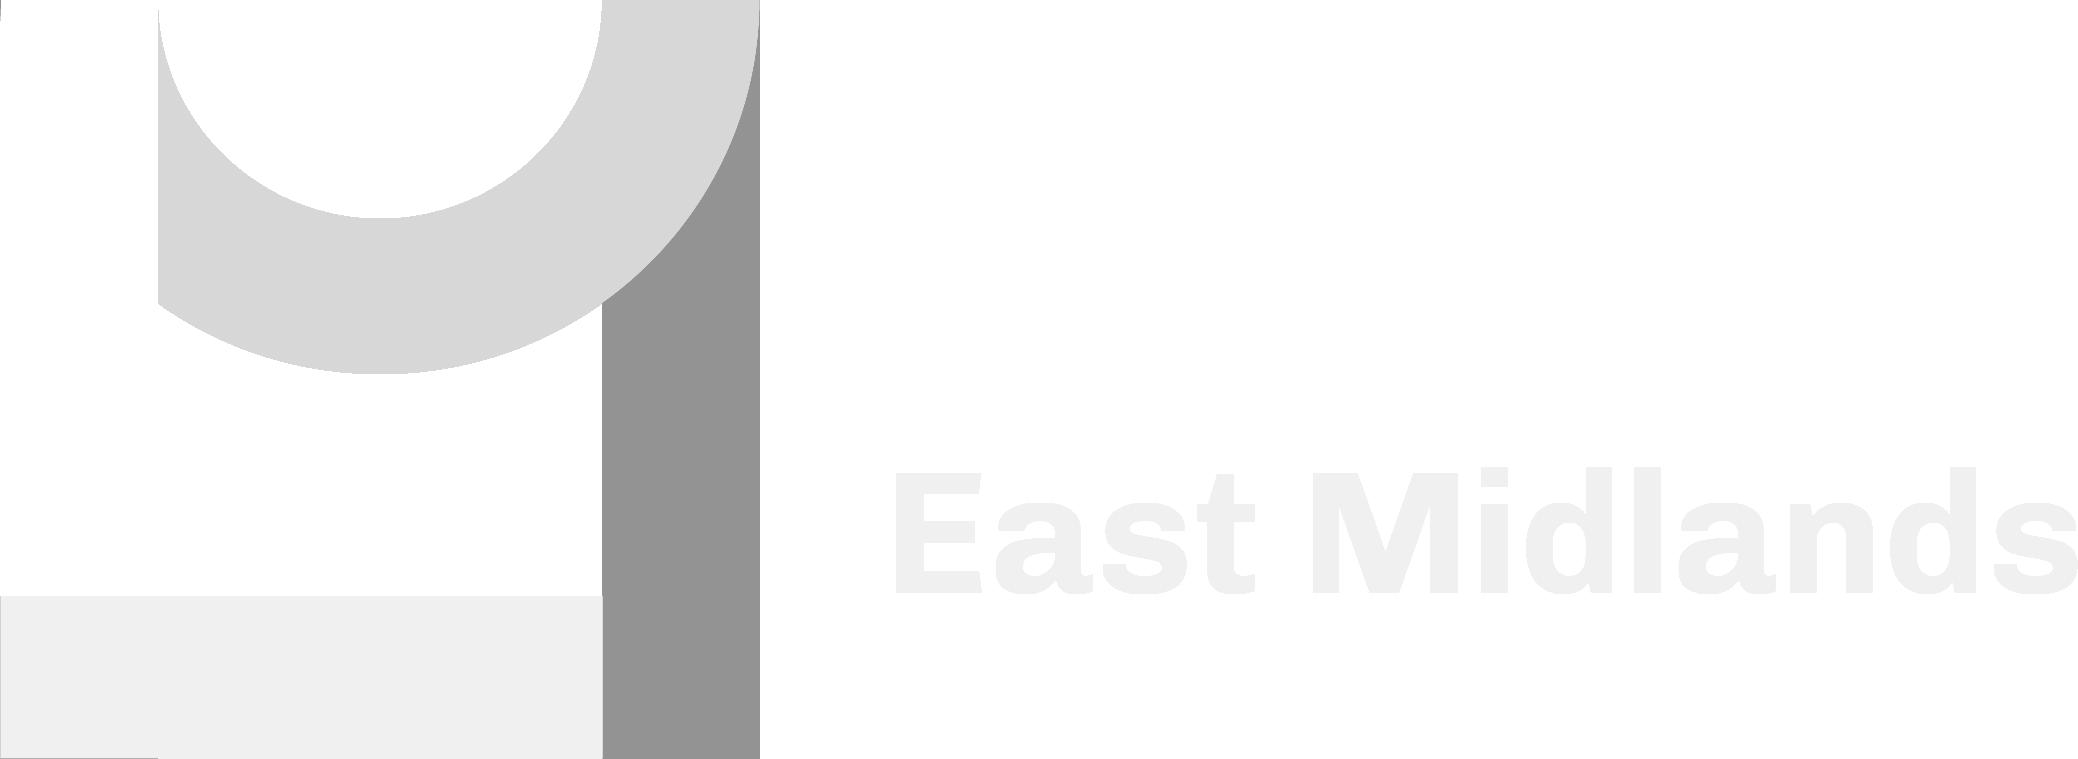 Museum Development East Midlands logo